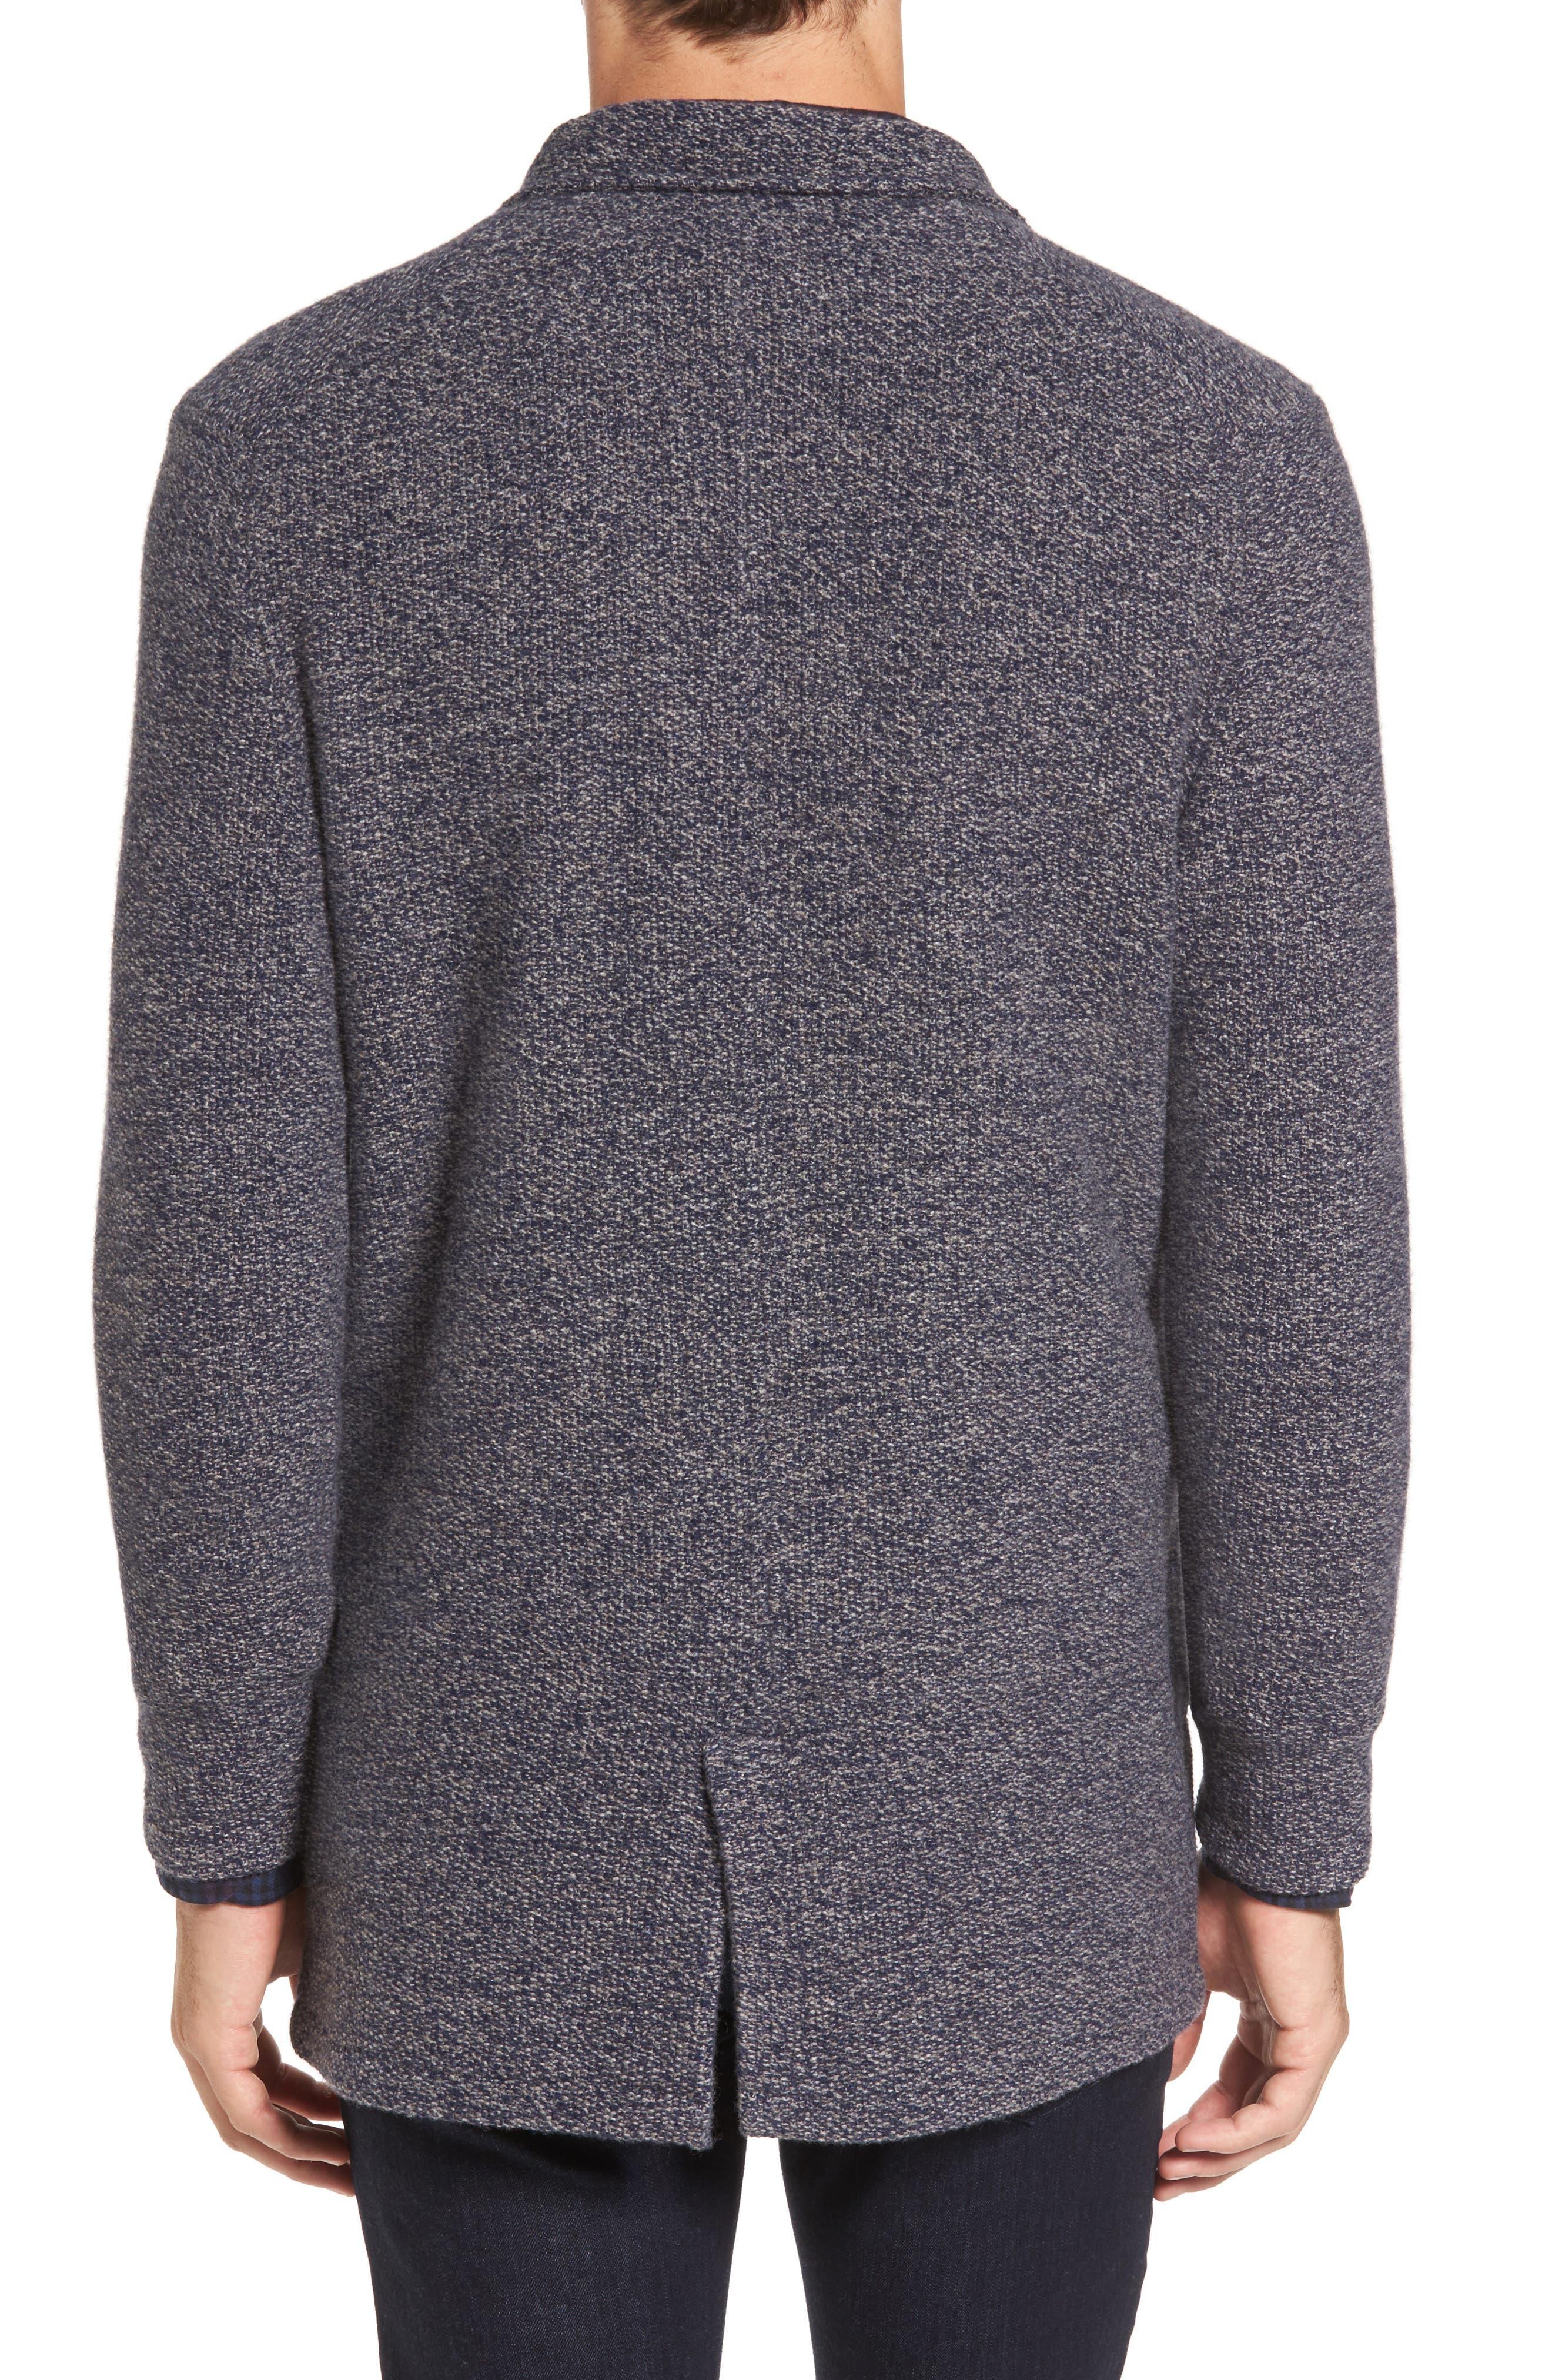 Deconstructed Merino & Yak Wool Sweater Jacket,                             Alternate thumbnail 2, color,                             416